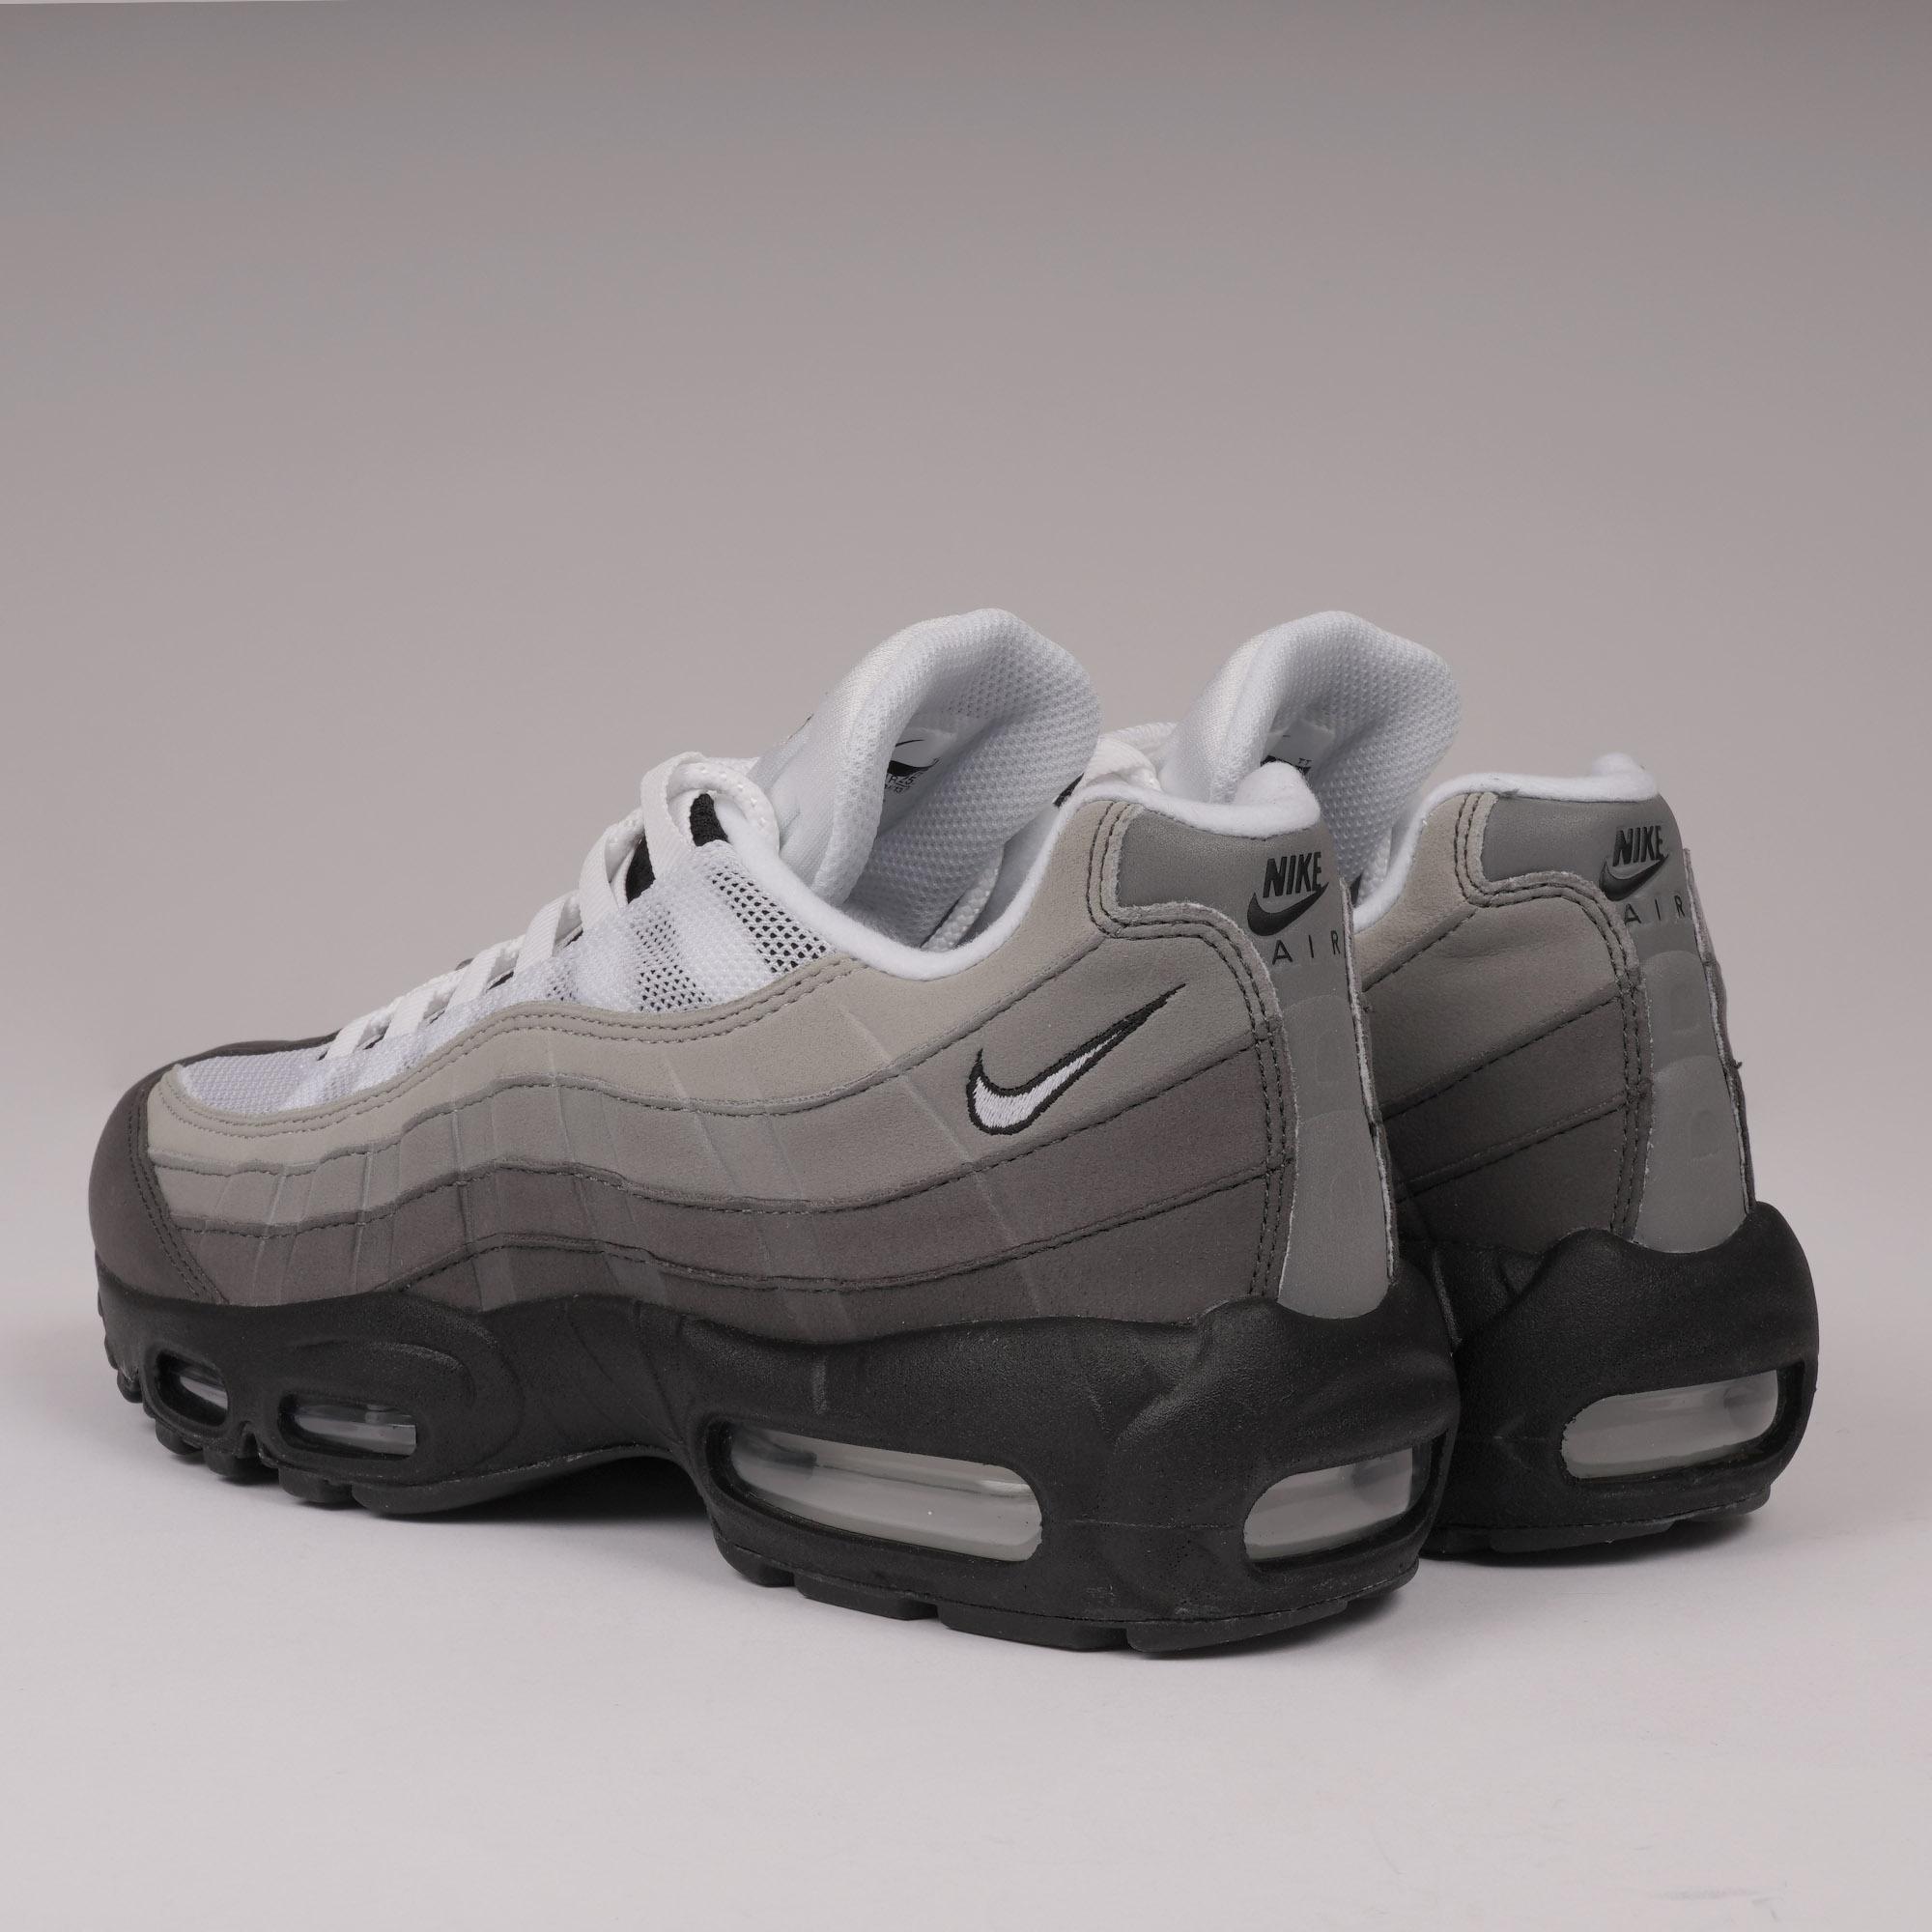 online here shop best sneakers Air Max 95 Og - Black, White, Granite & Dust